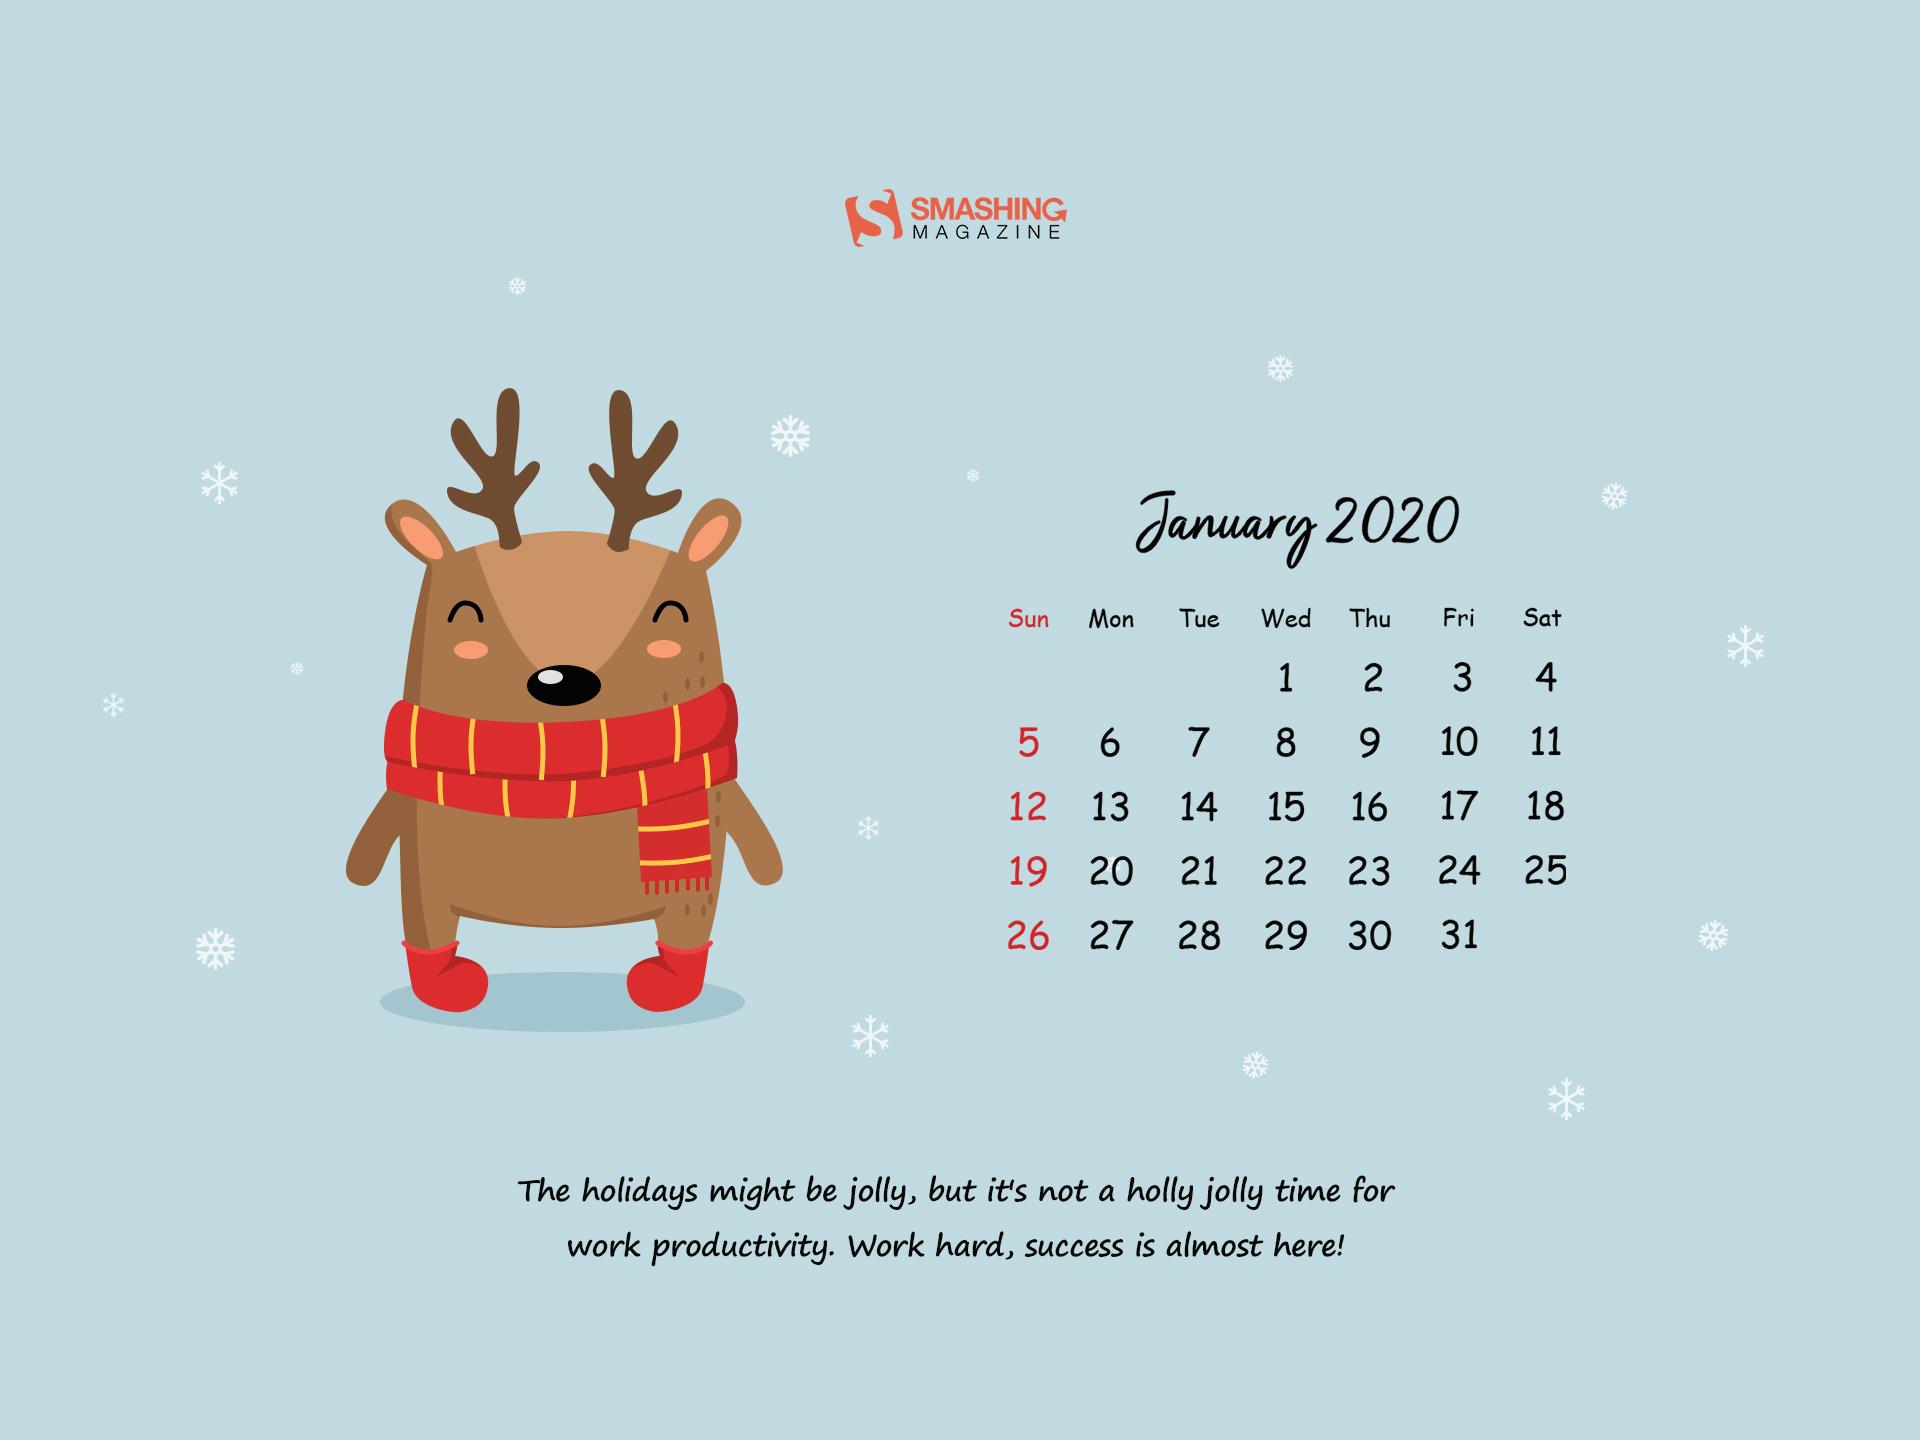 New Adventures Ahead January 2020 Wallpapers Smashing Magazine 1920x1440